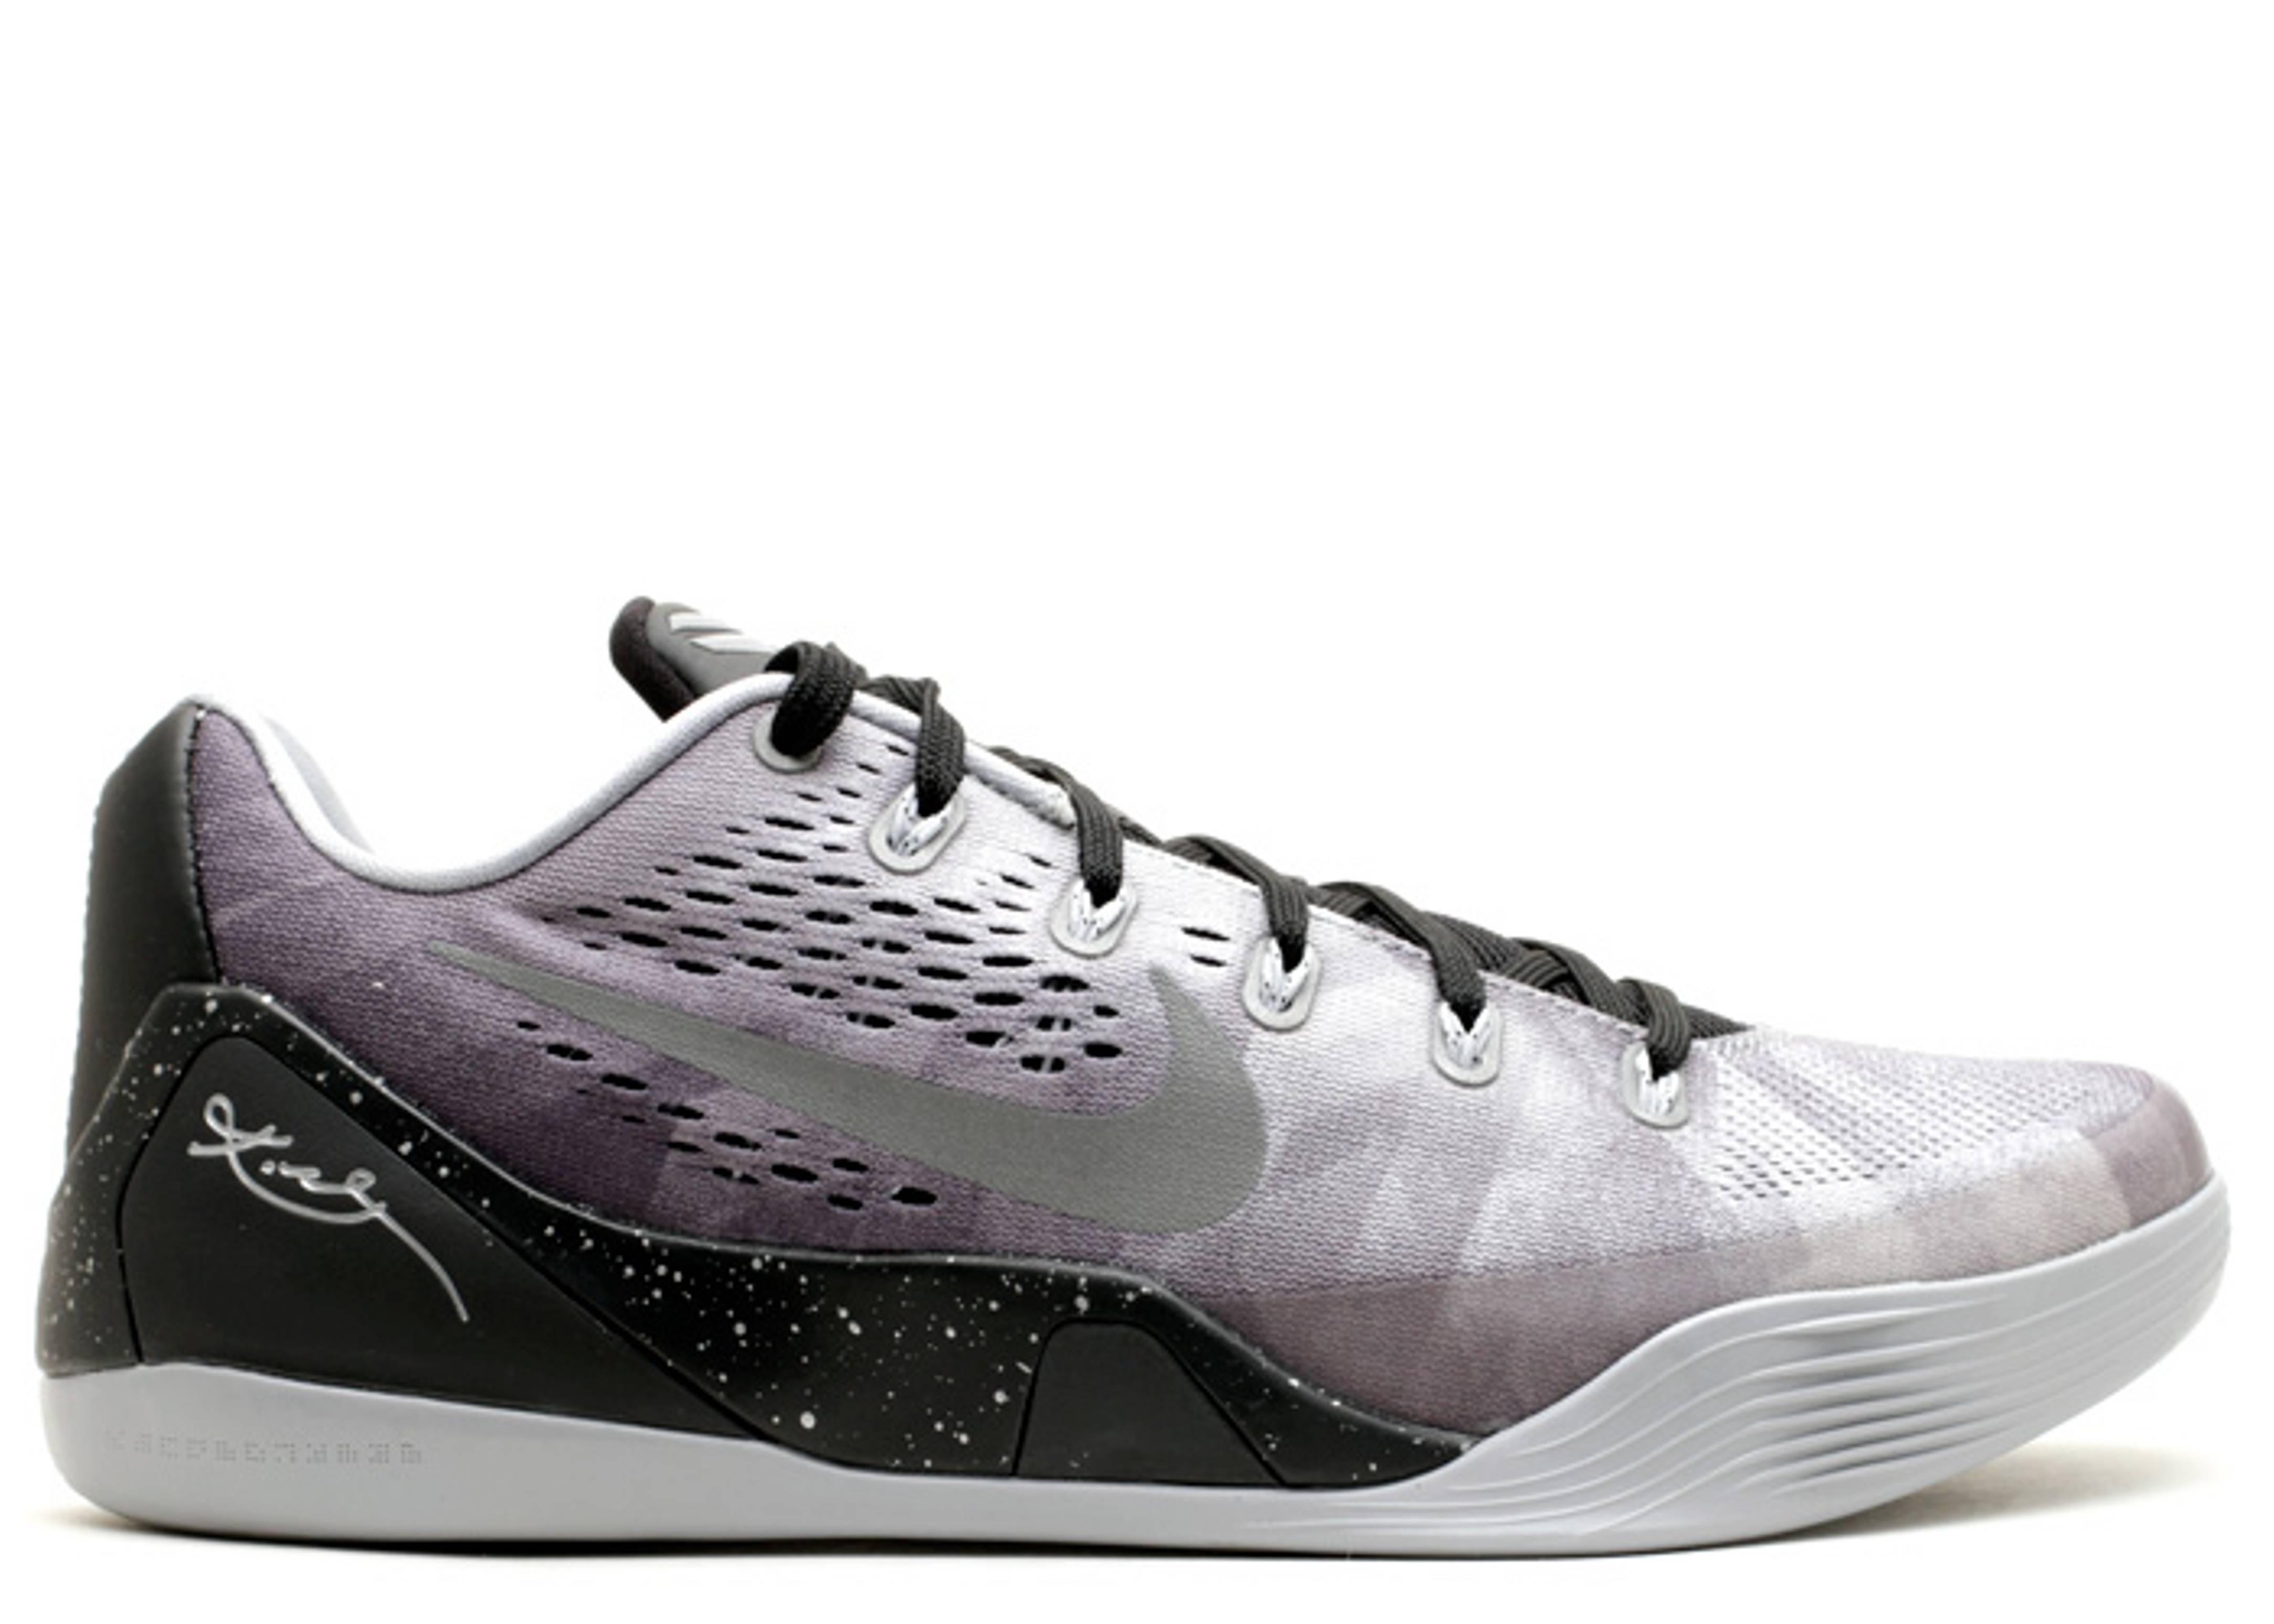 Kobe 9 Prm Blackmetallic Silver